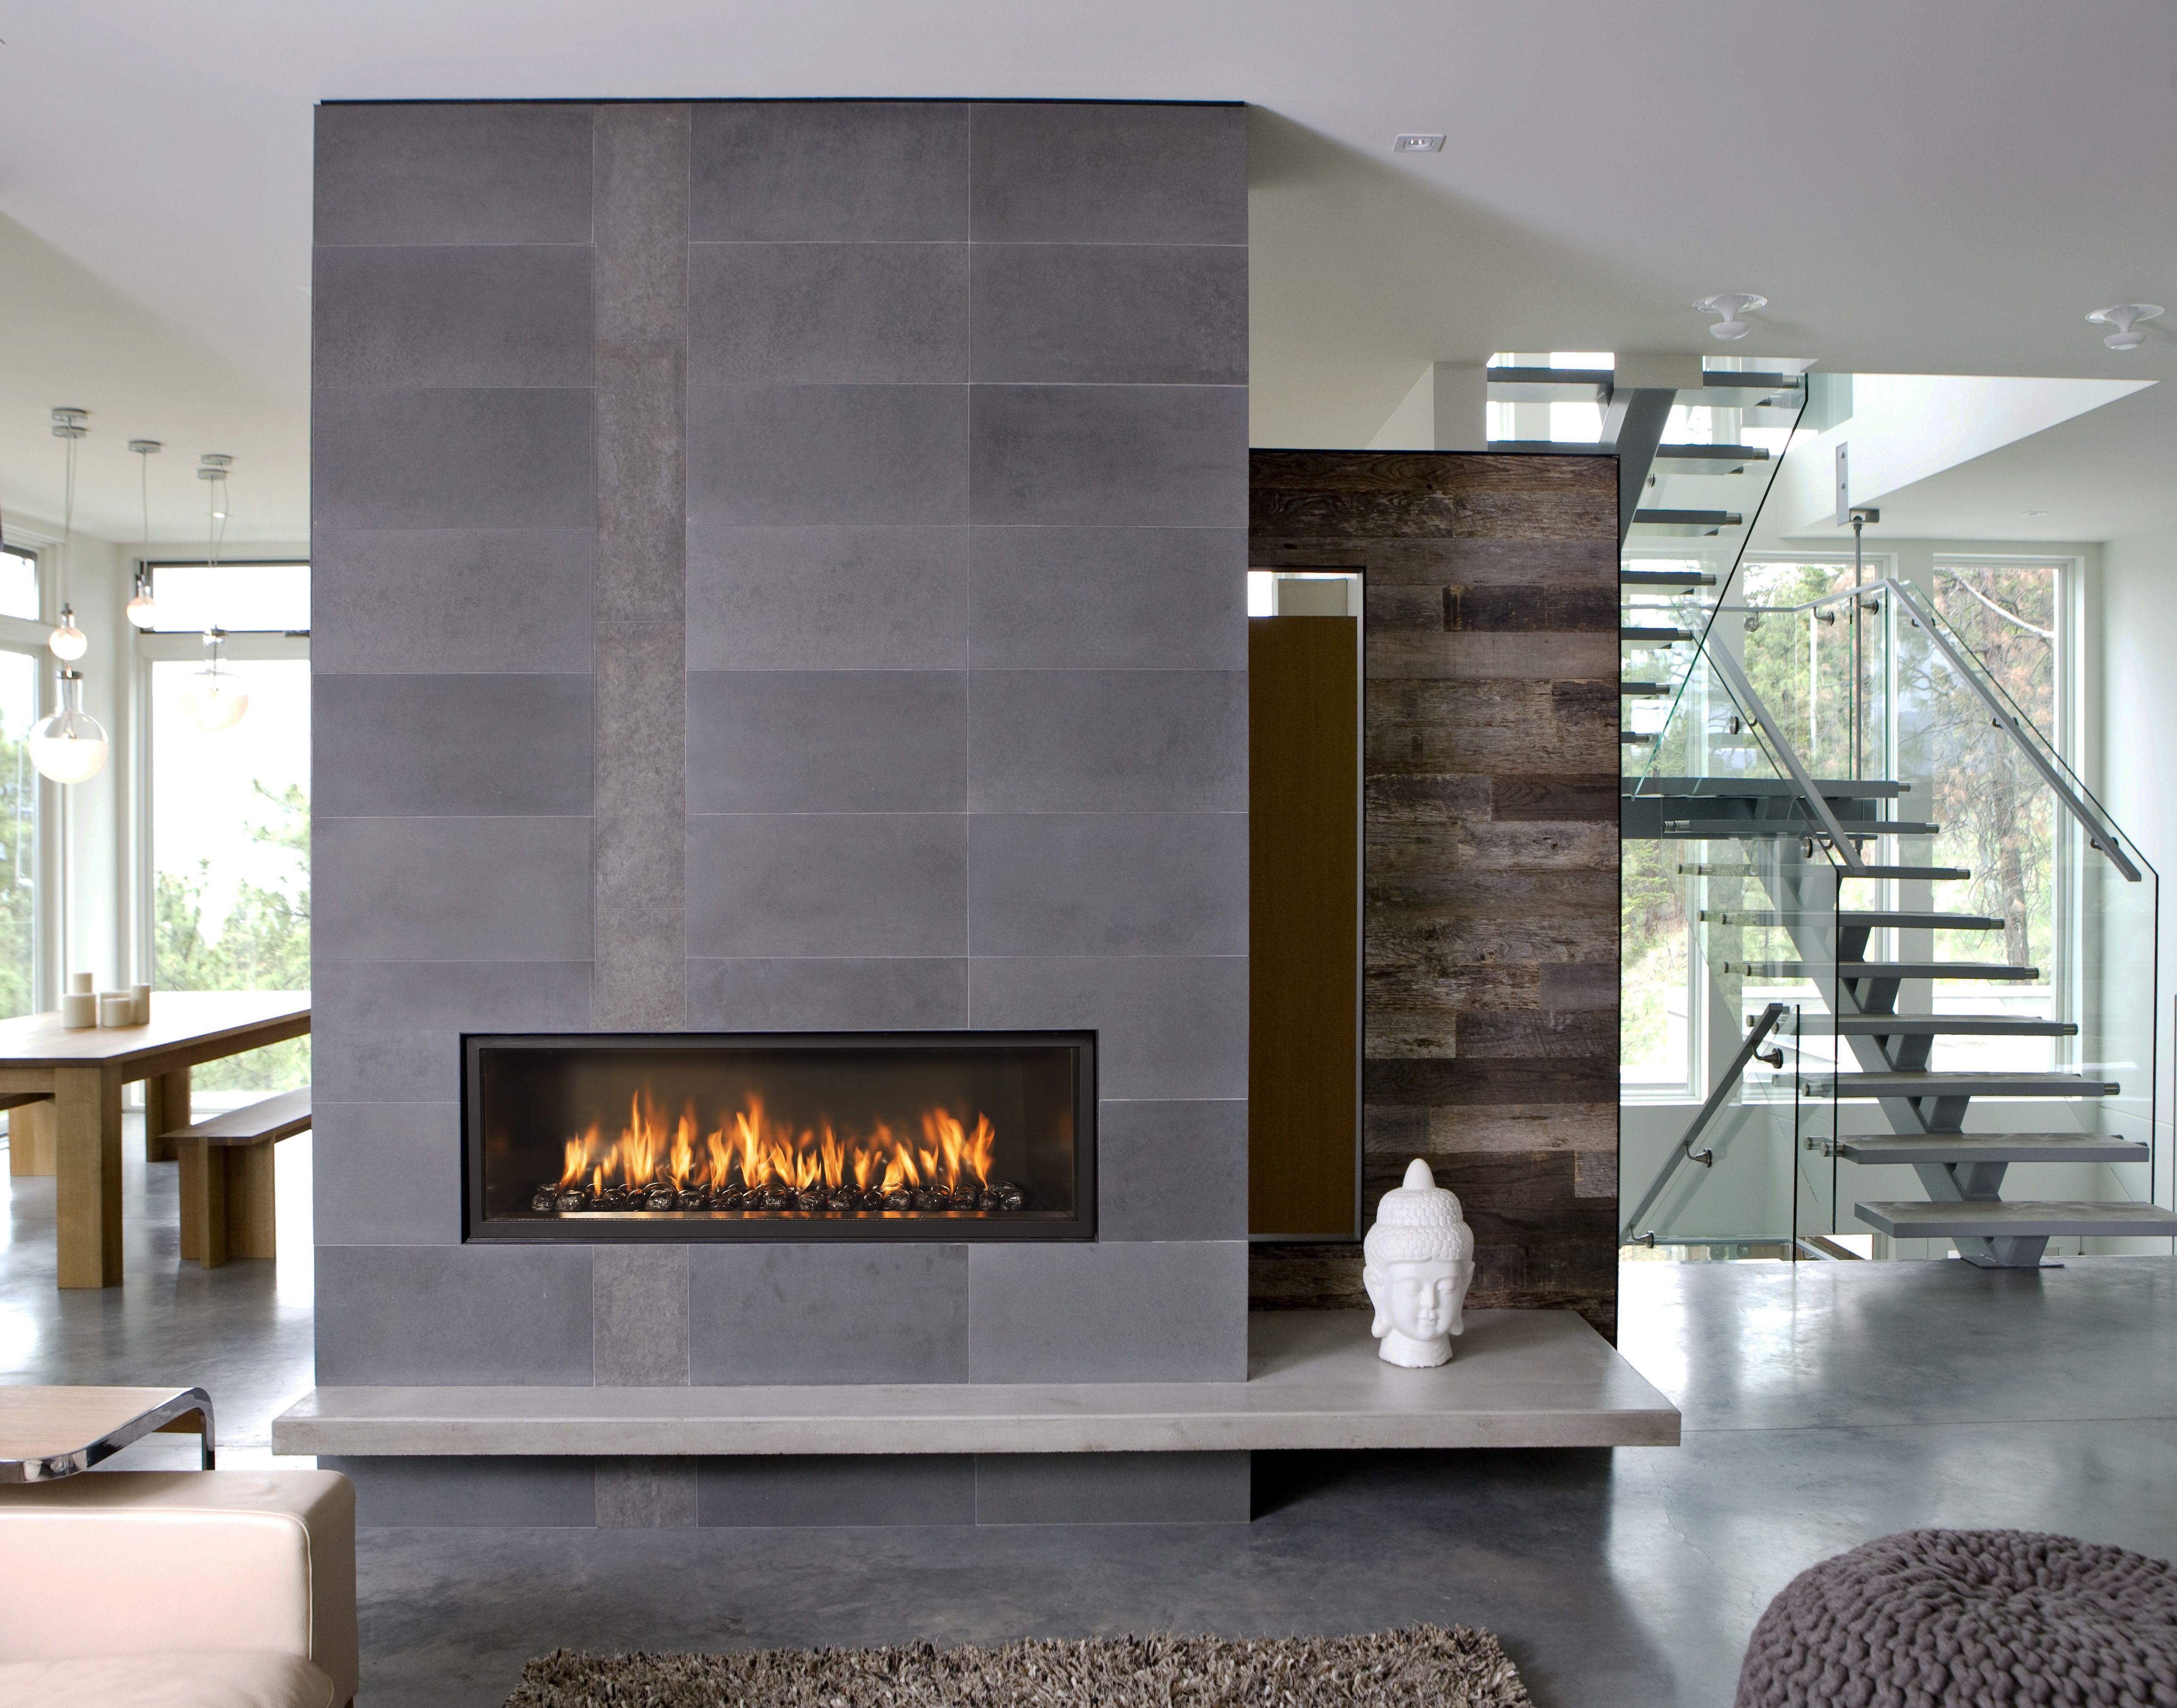 Home Slate Gray Reclaimed Wood Modern Fireplace Mantel Ideas Living Wall